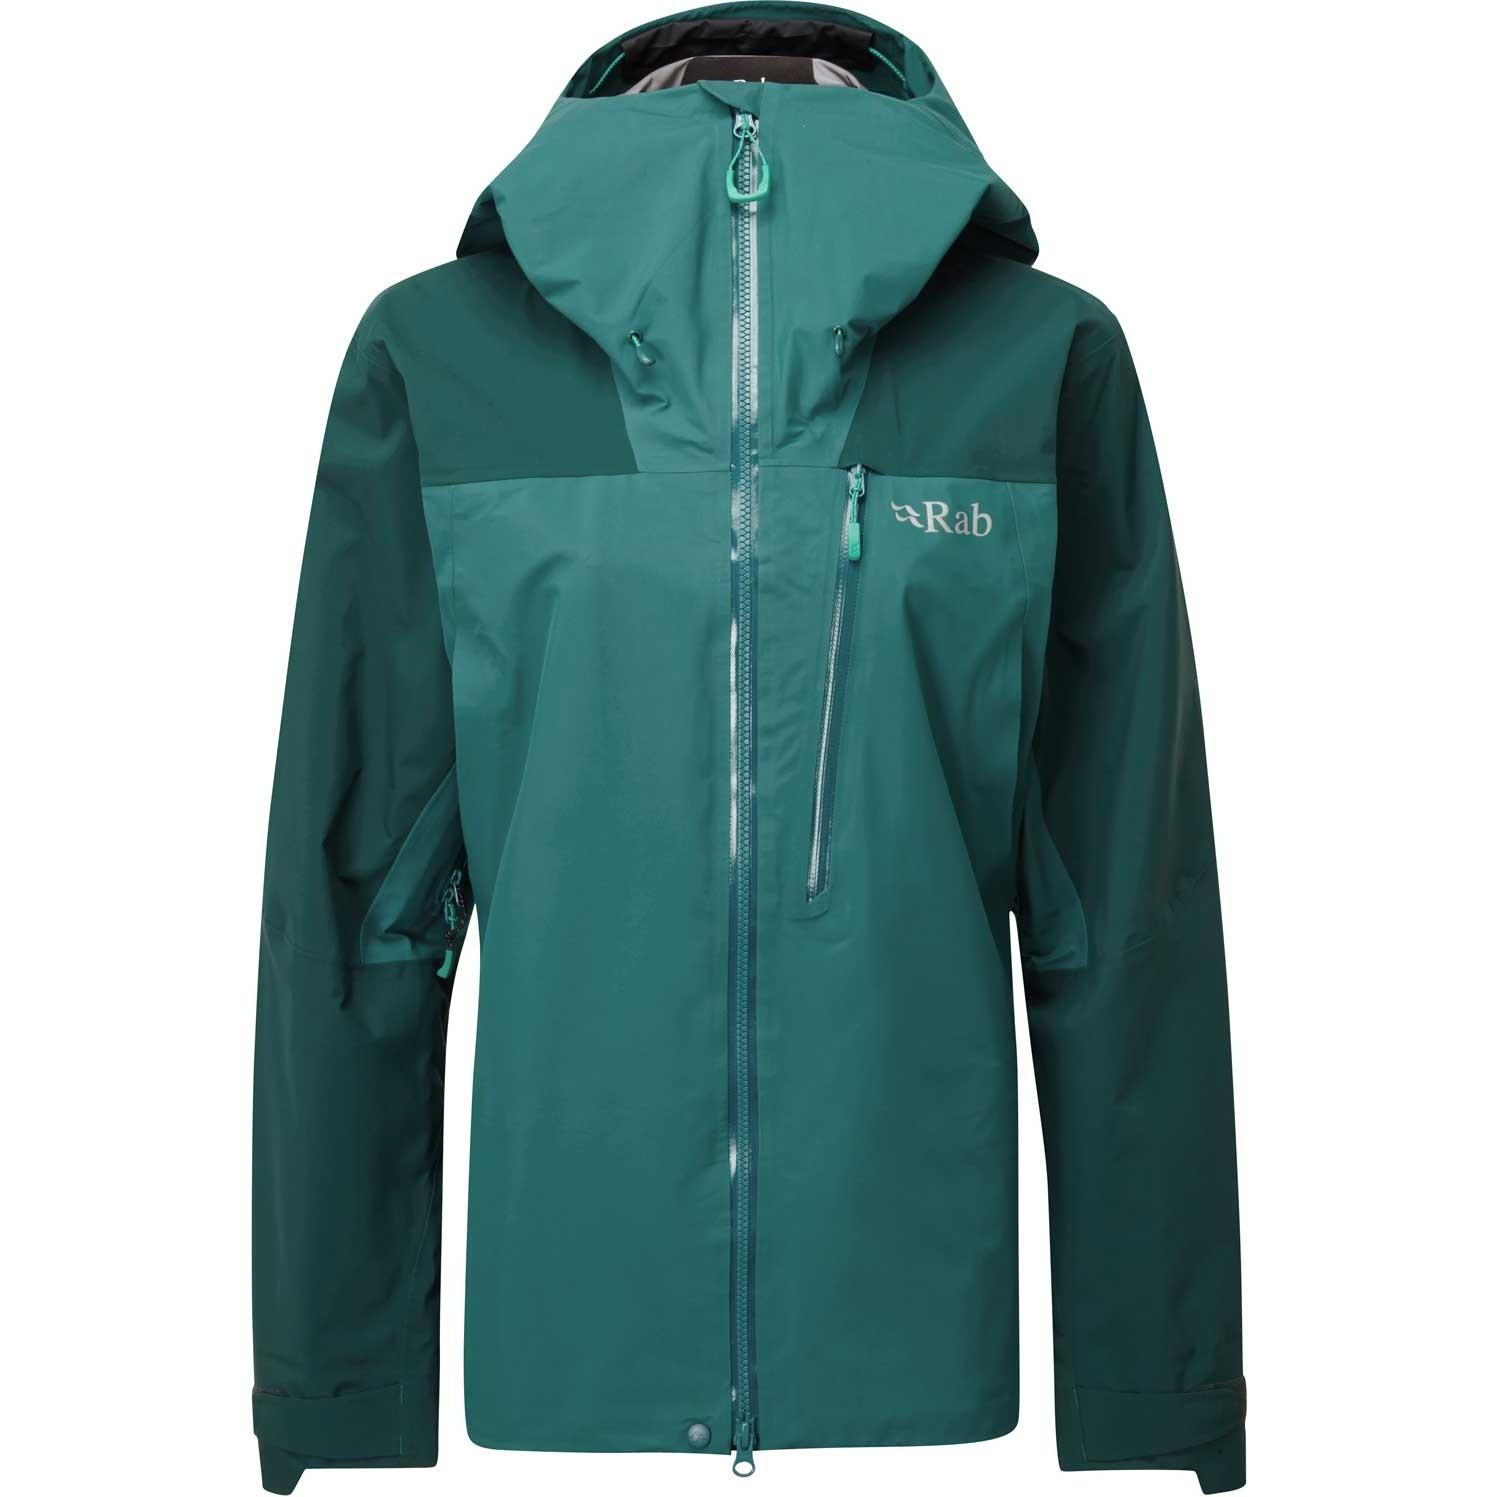 Ladakh GTX Waterproof Jacket - Women's - Sagano Green/Atlantis